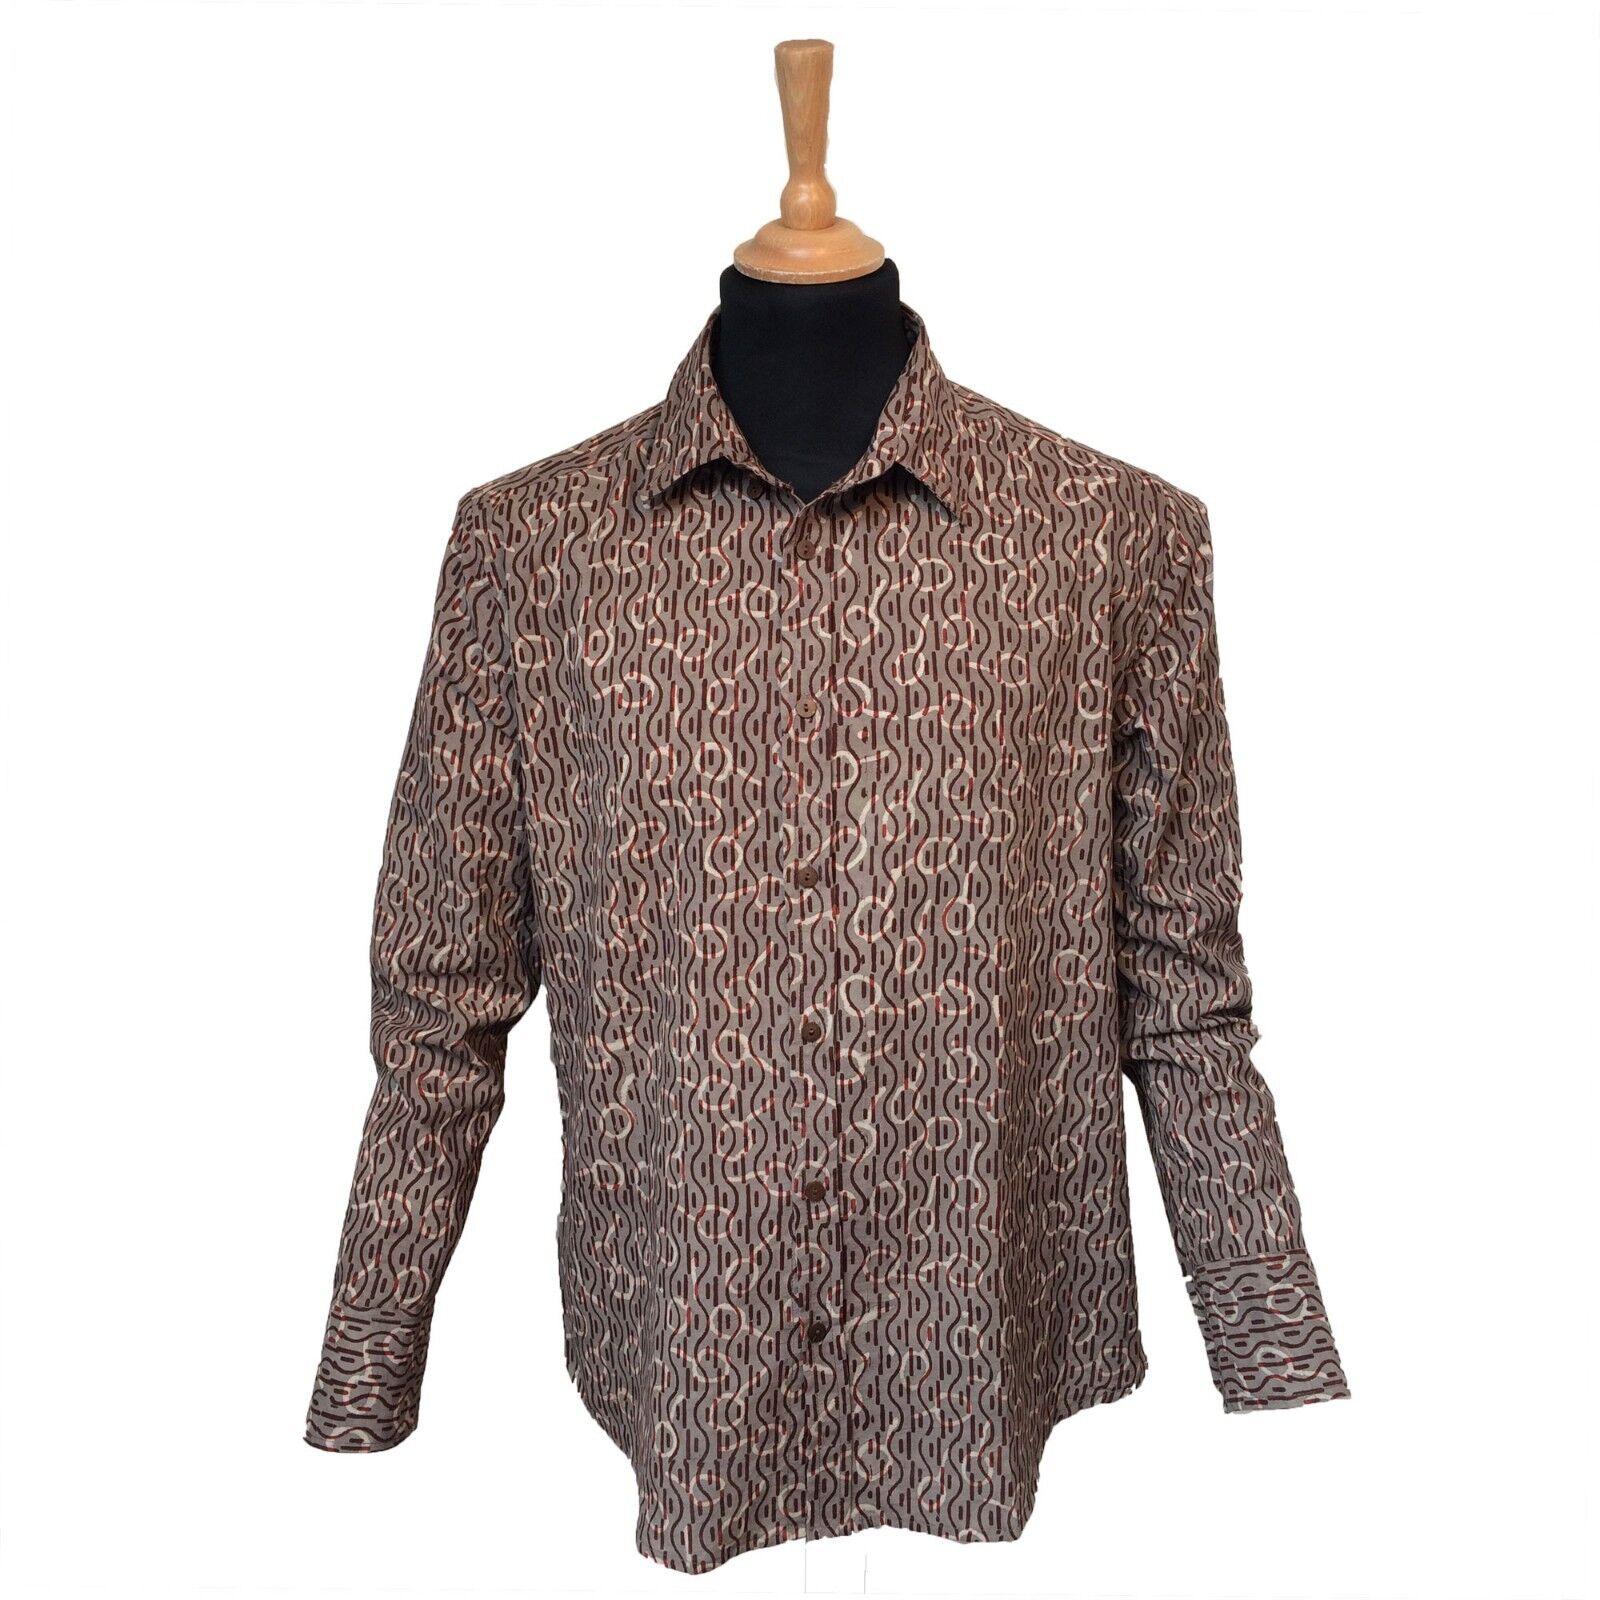 UNIQUE all over print long sleeve cotton shirt, casual, button down collar (E) | Düsseldorf Online Shop  | Abgabepreis